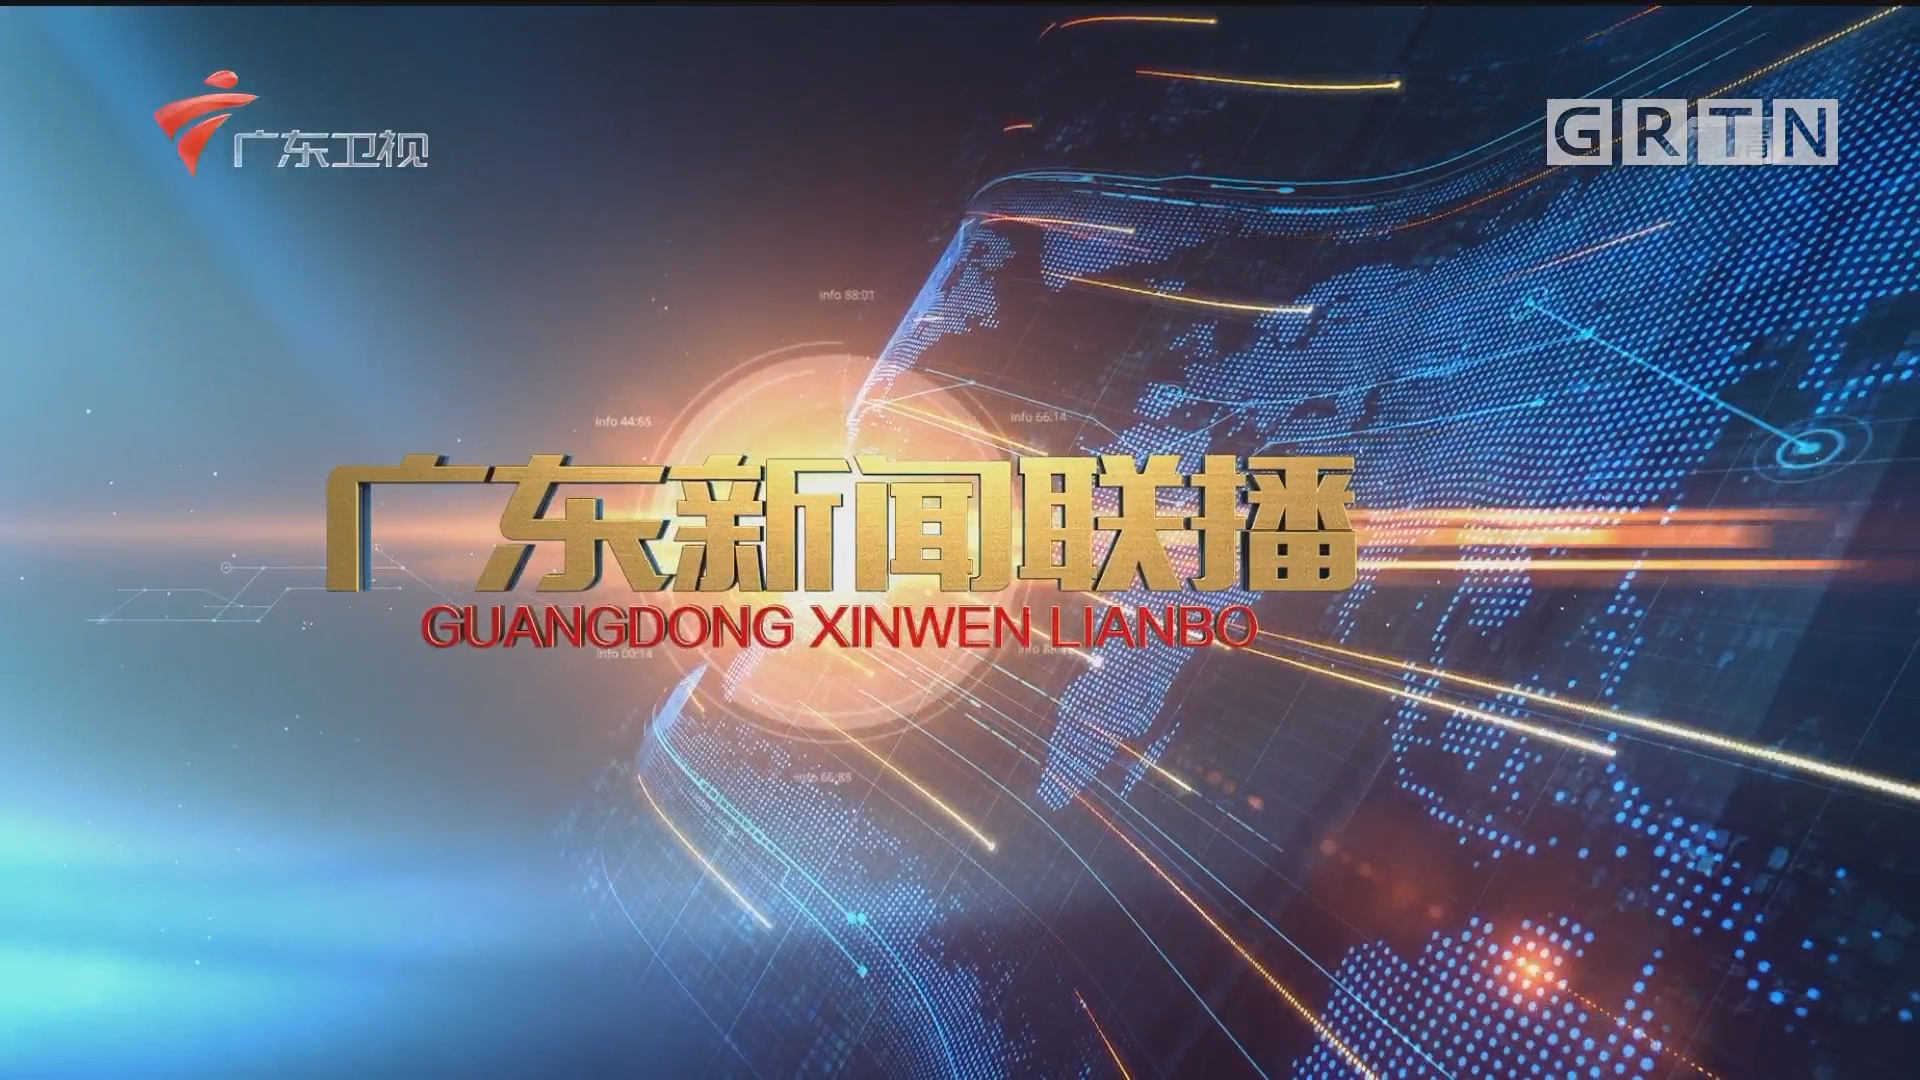 [HD][2017-11-30]广东新闻联播:中共中央政治局召开会议 审议通过《中国共产党党务公开条例(试行)》